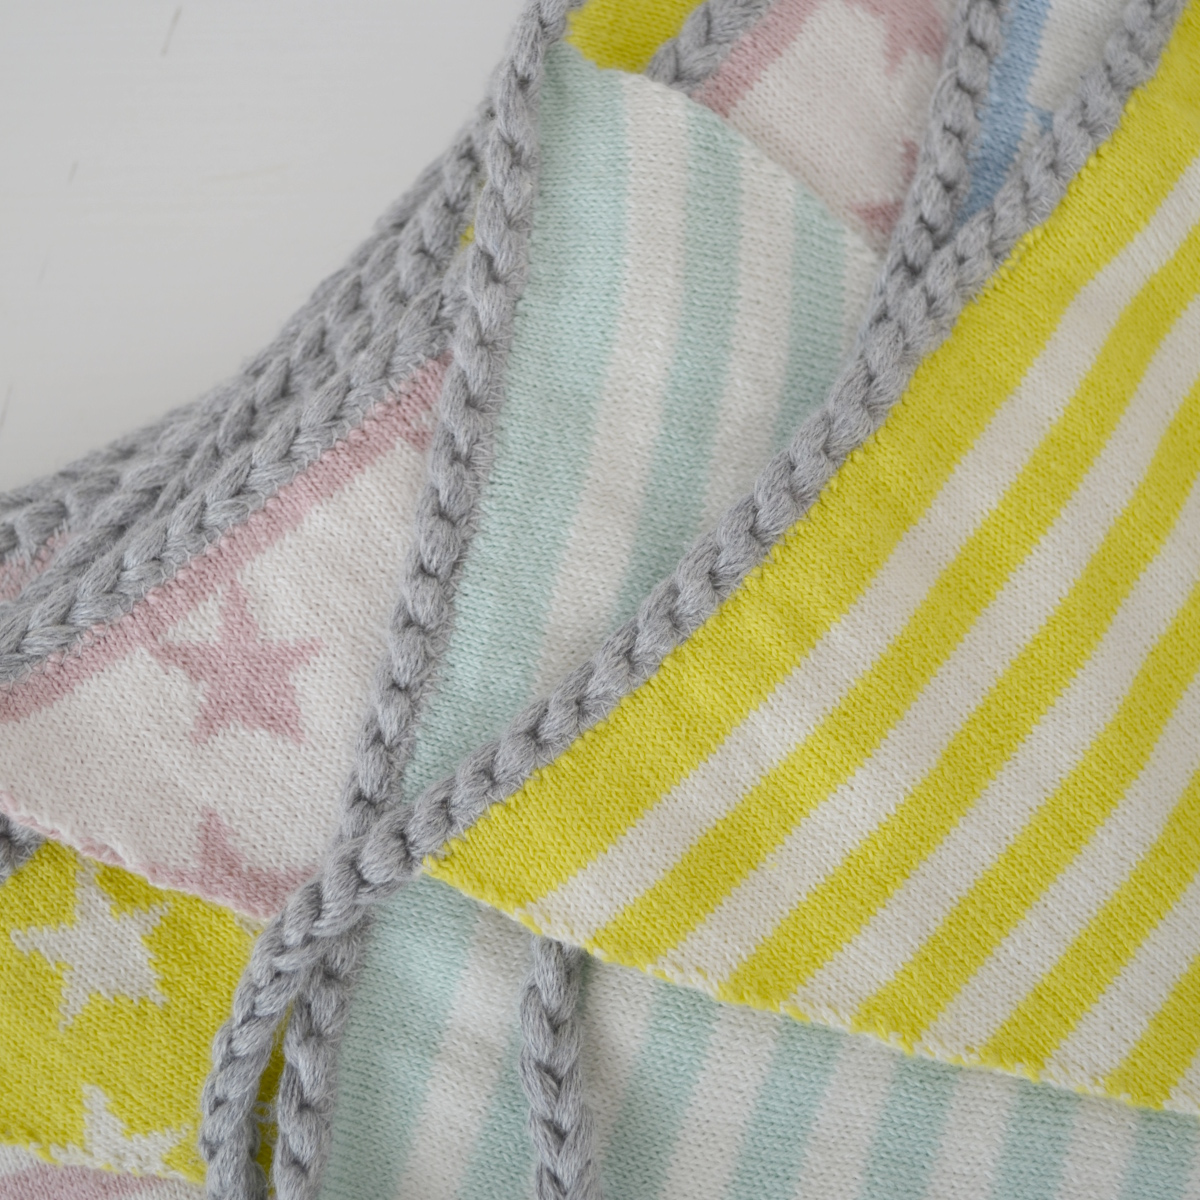 cotton bunting detail